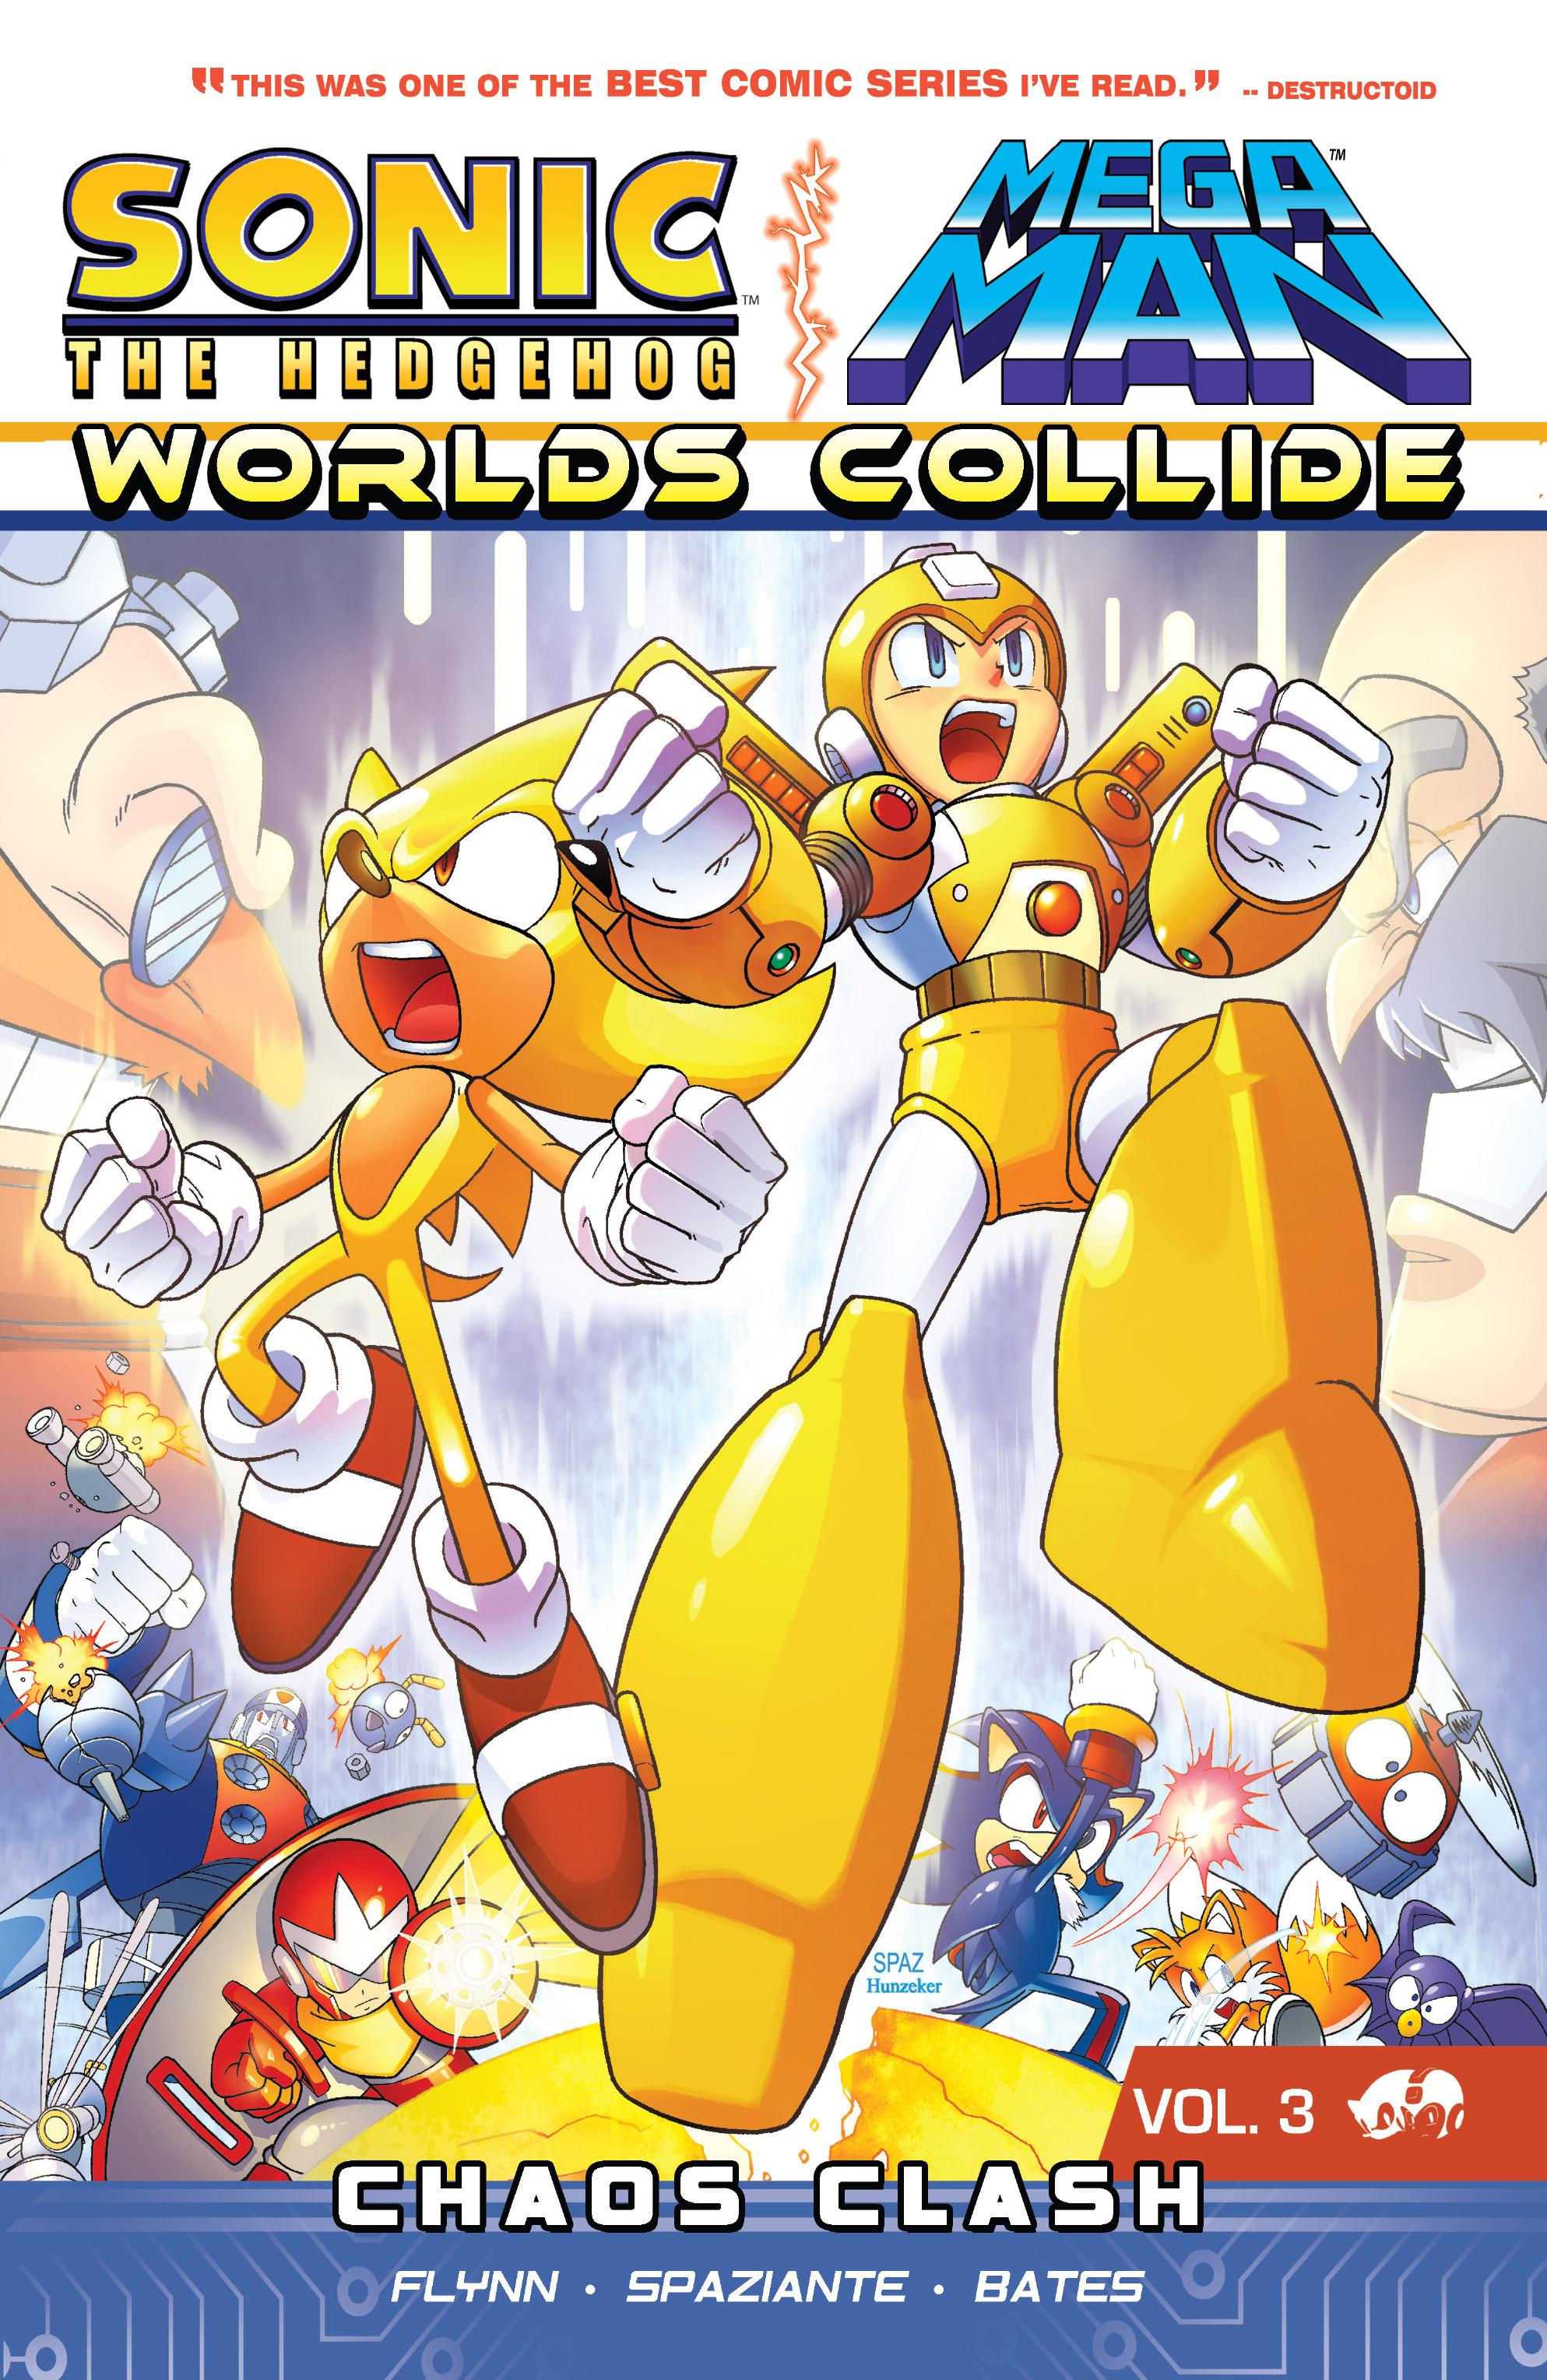 Sonic Mega Man Worlds Collide Vol_3 Page 1